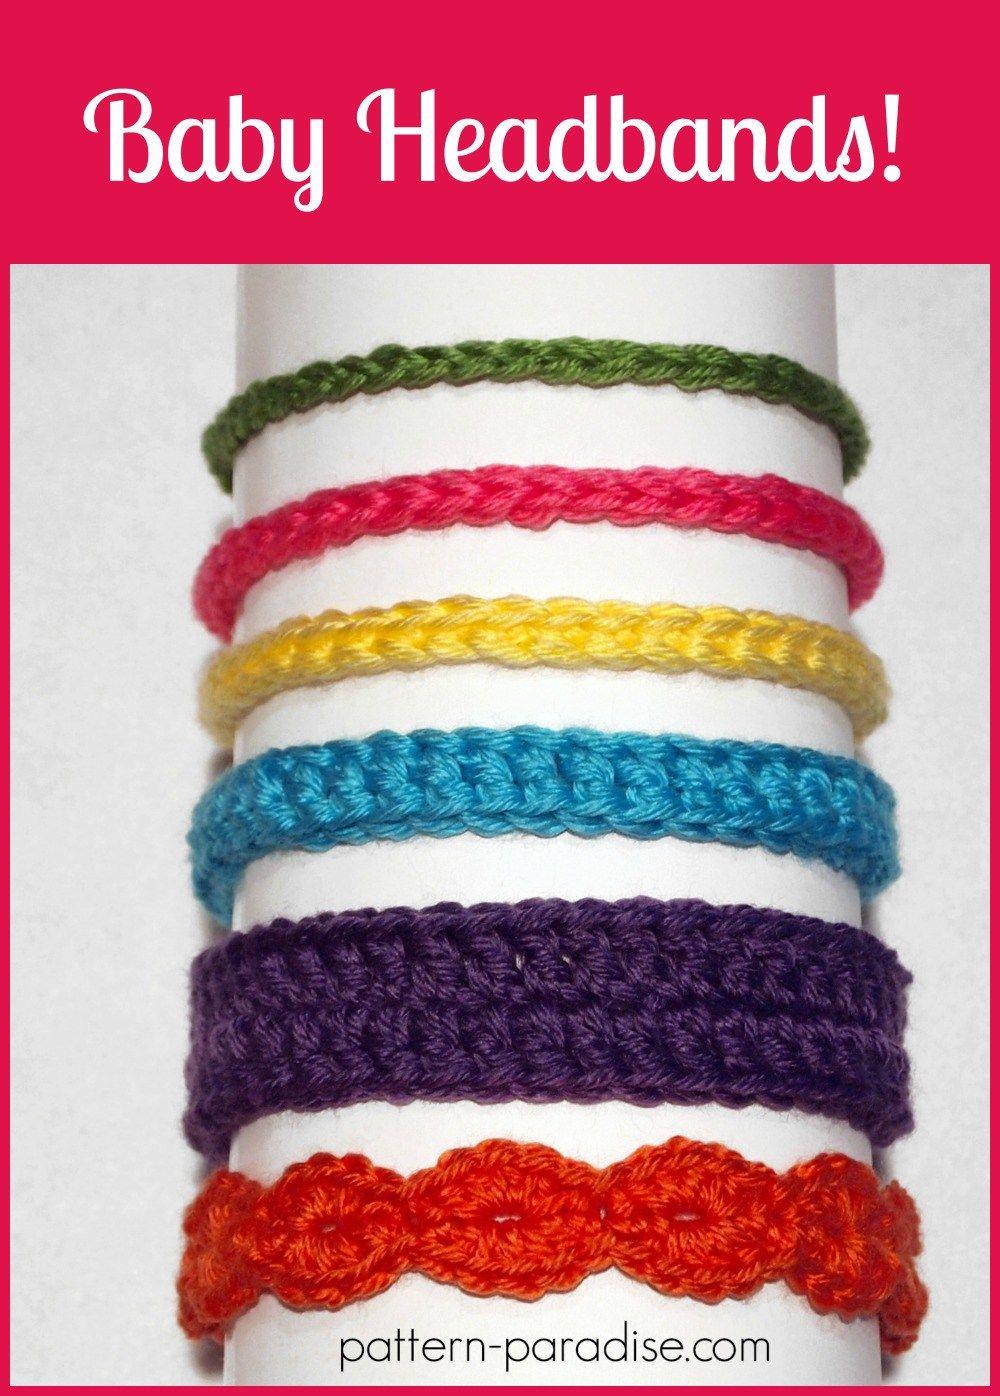 Free Crochet Pattern: Six Styles of Baby Headbands | Pattern Paradise #crochetedheadbands